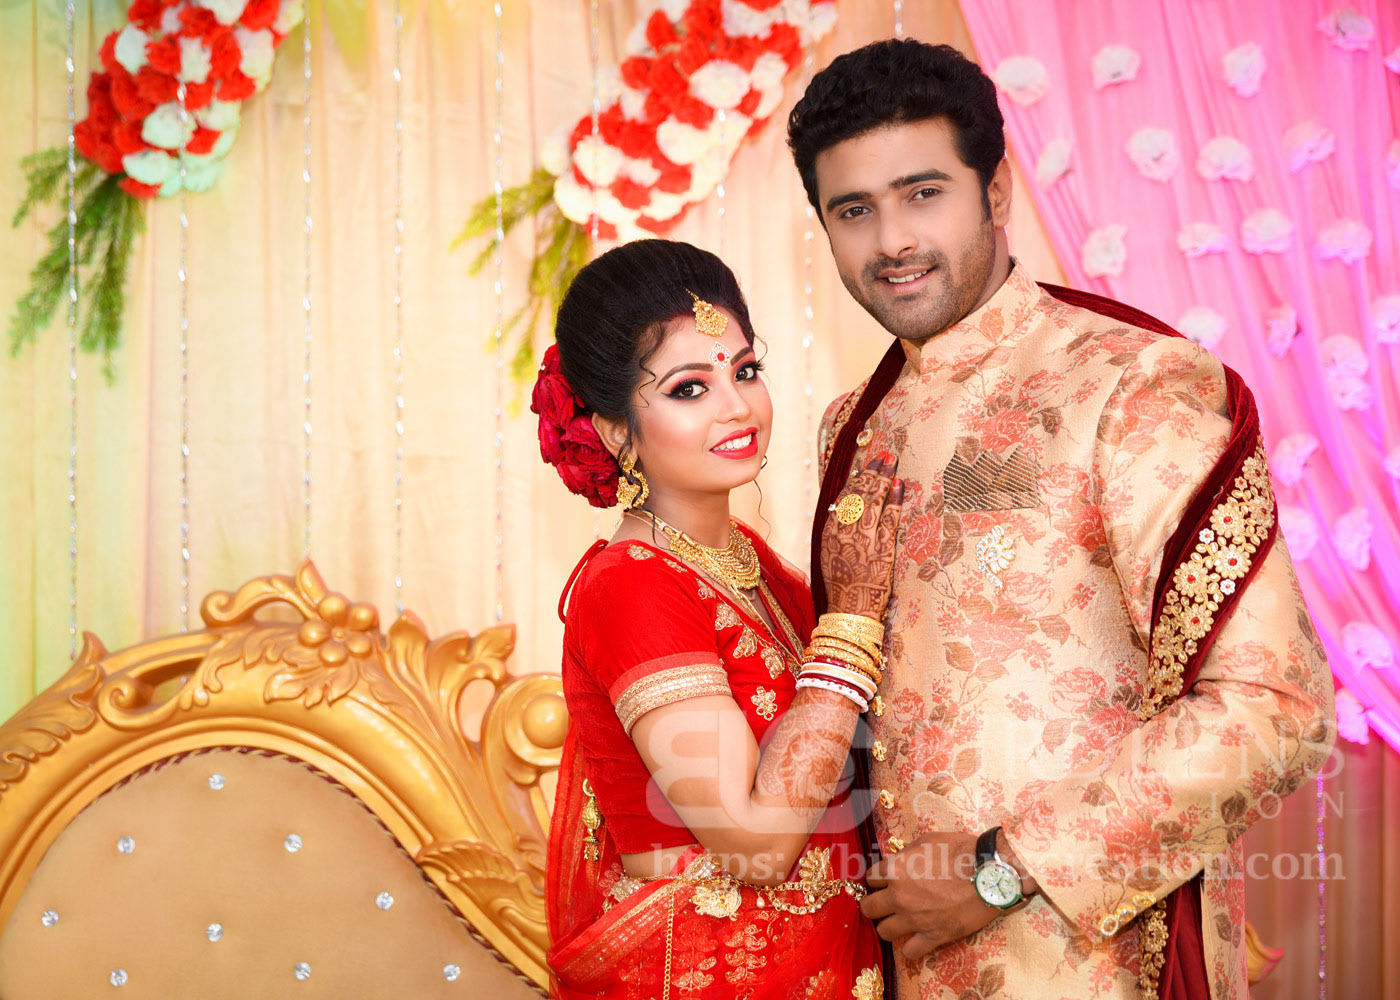 Professional Candid Wedding Photographer in Kolkata